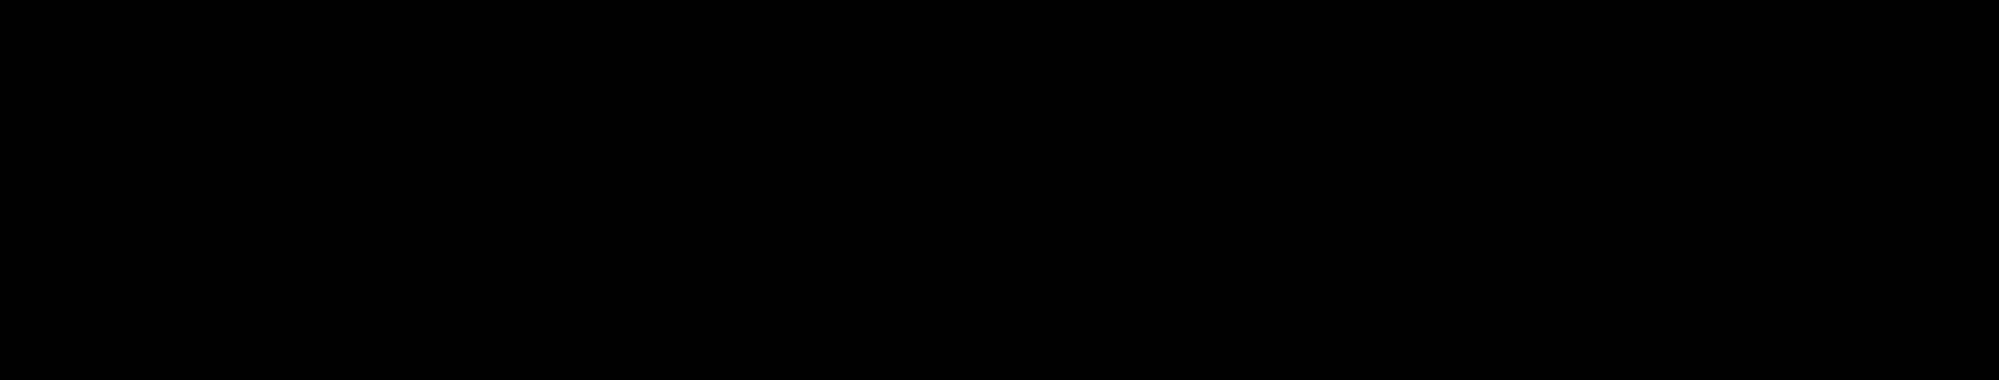 image70.png